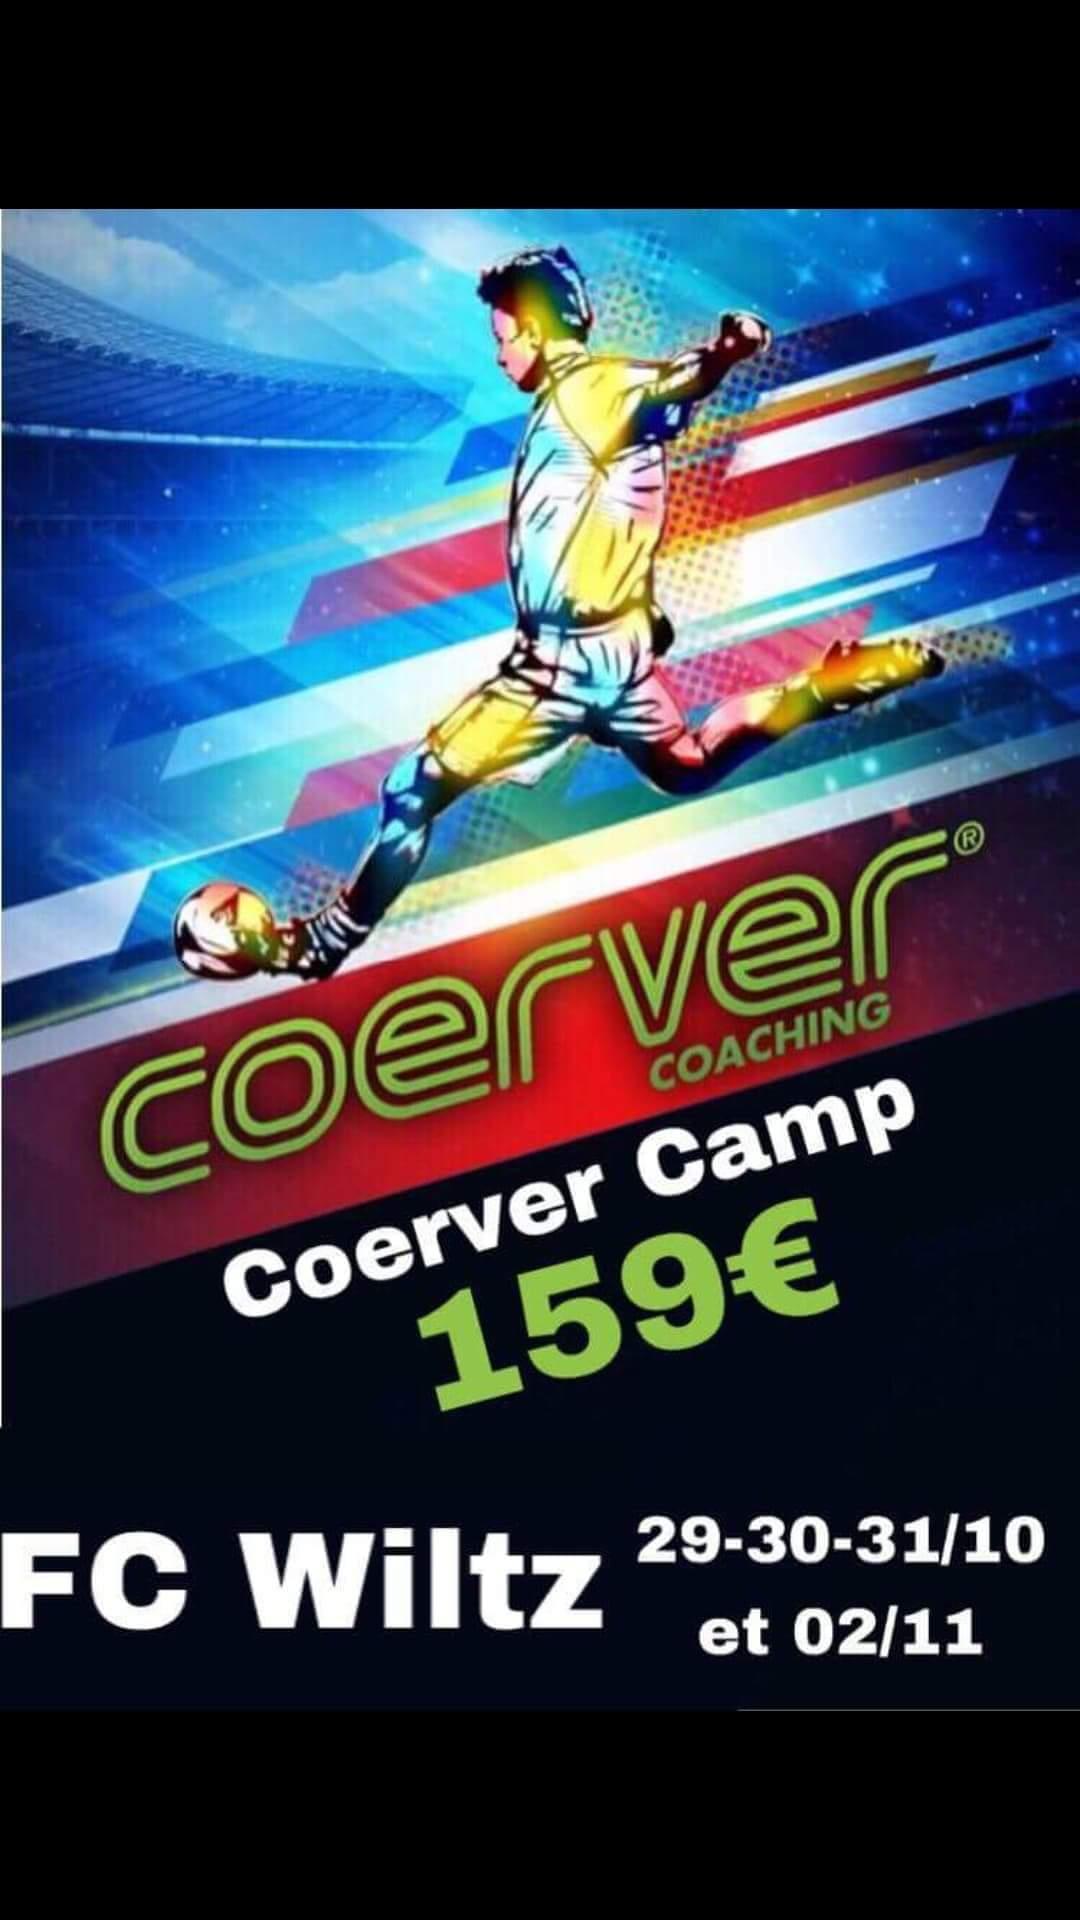 Coerver Camp